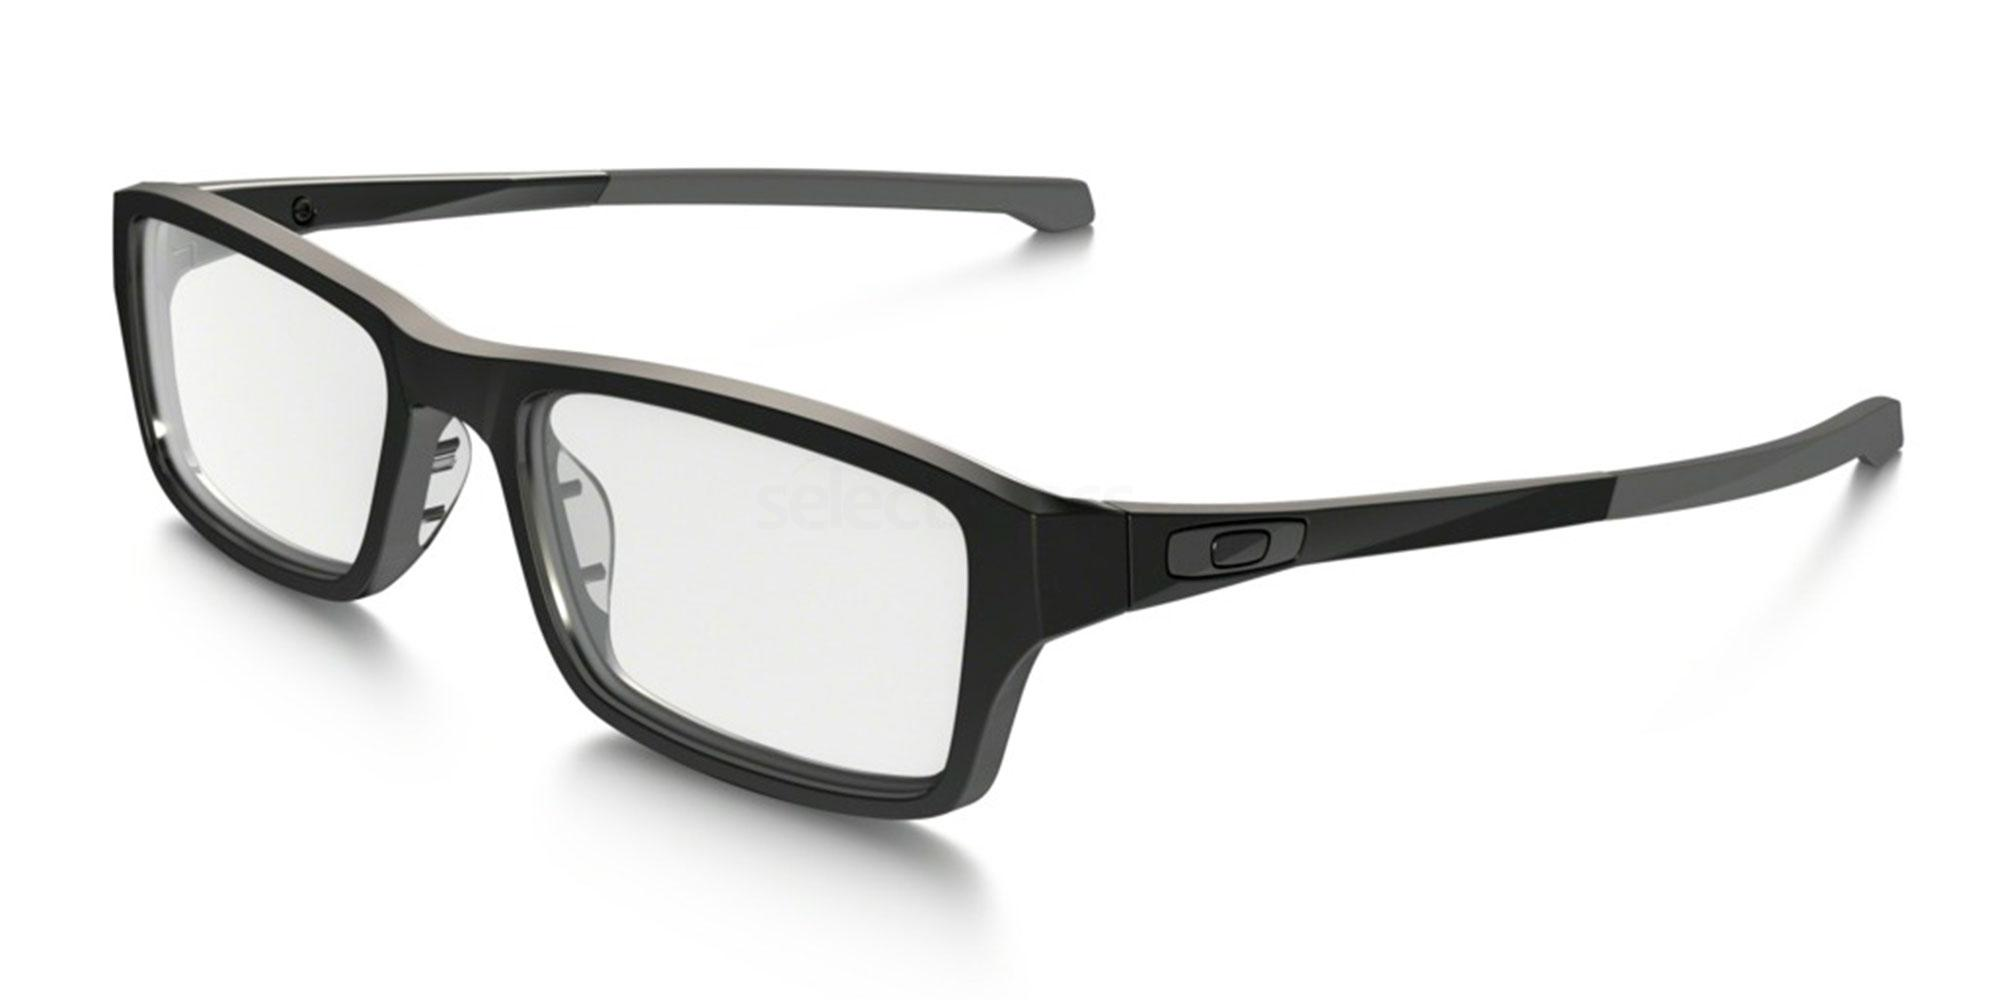 803901 OX8039 CHAMFER Glasses, Oakley